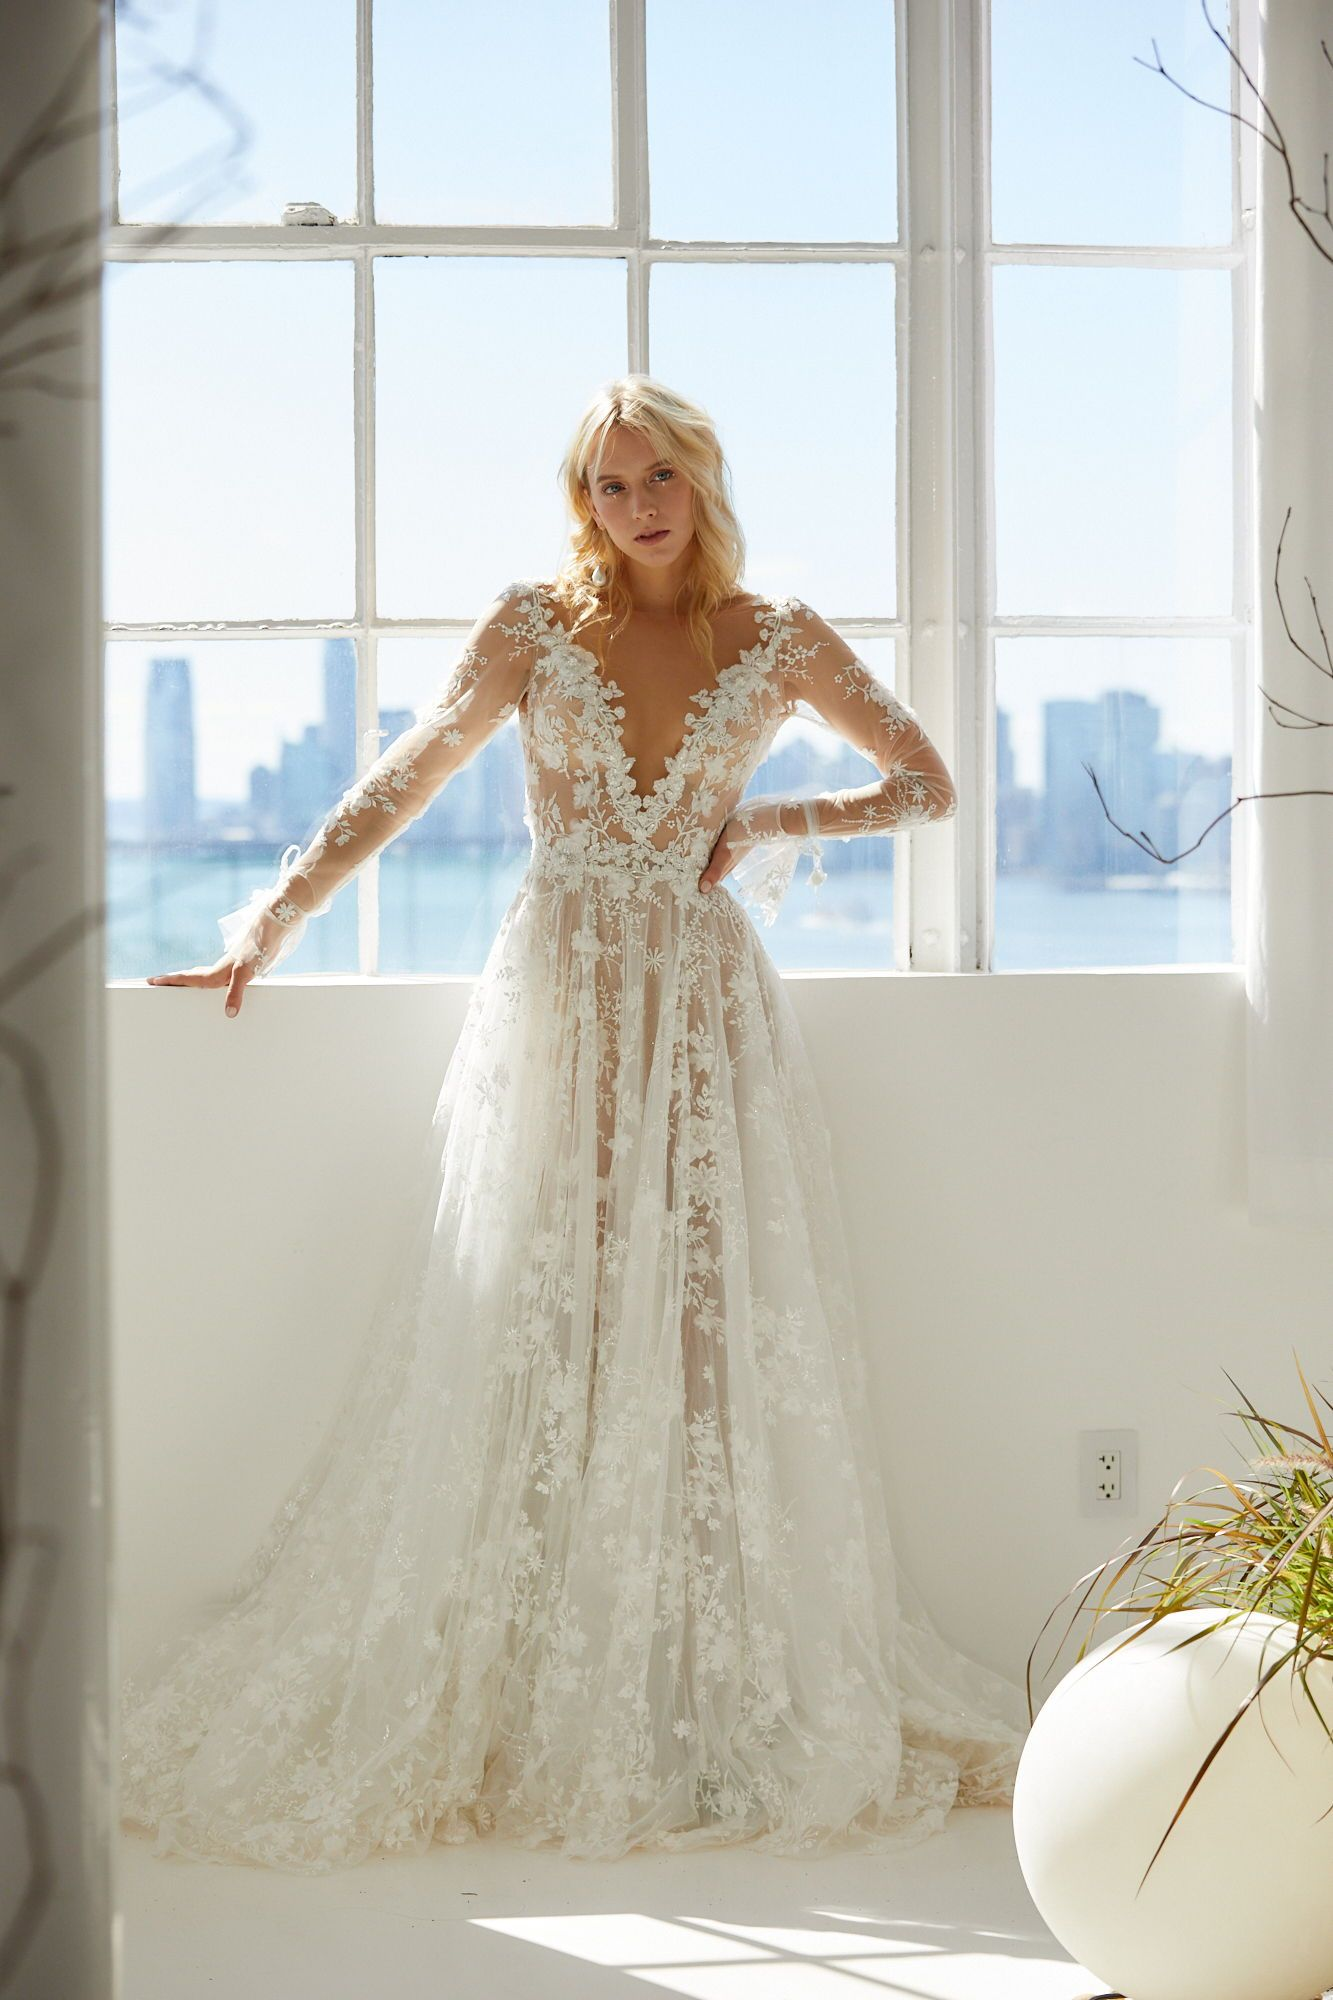 G 408 Wedding Dresses Whimsical Whimsical Dress Whimsical Wedding Gown